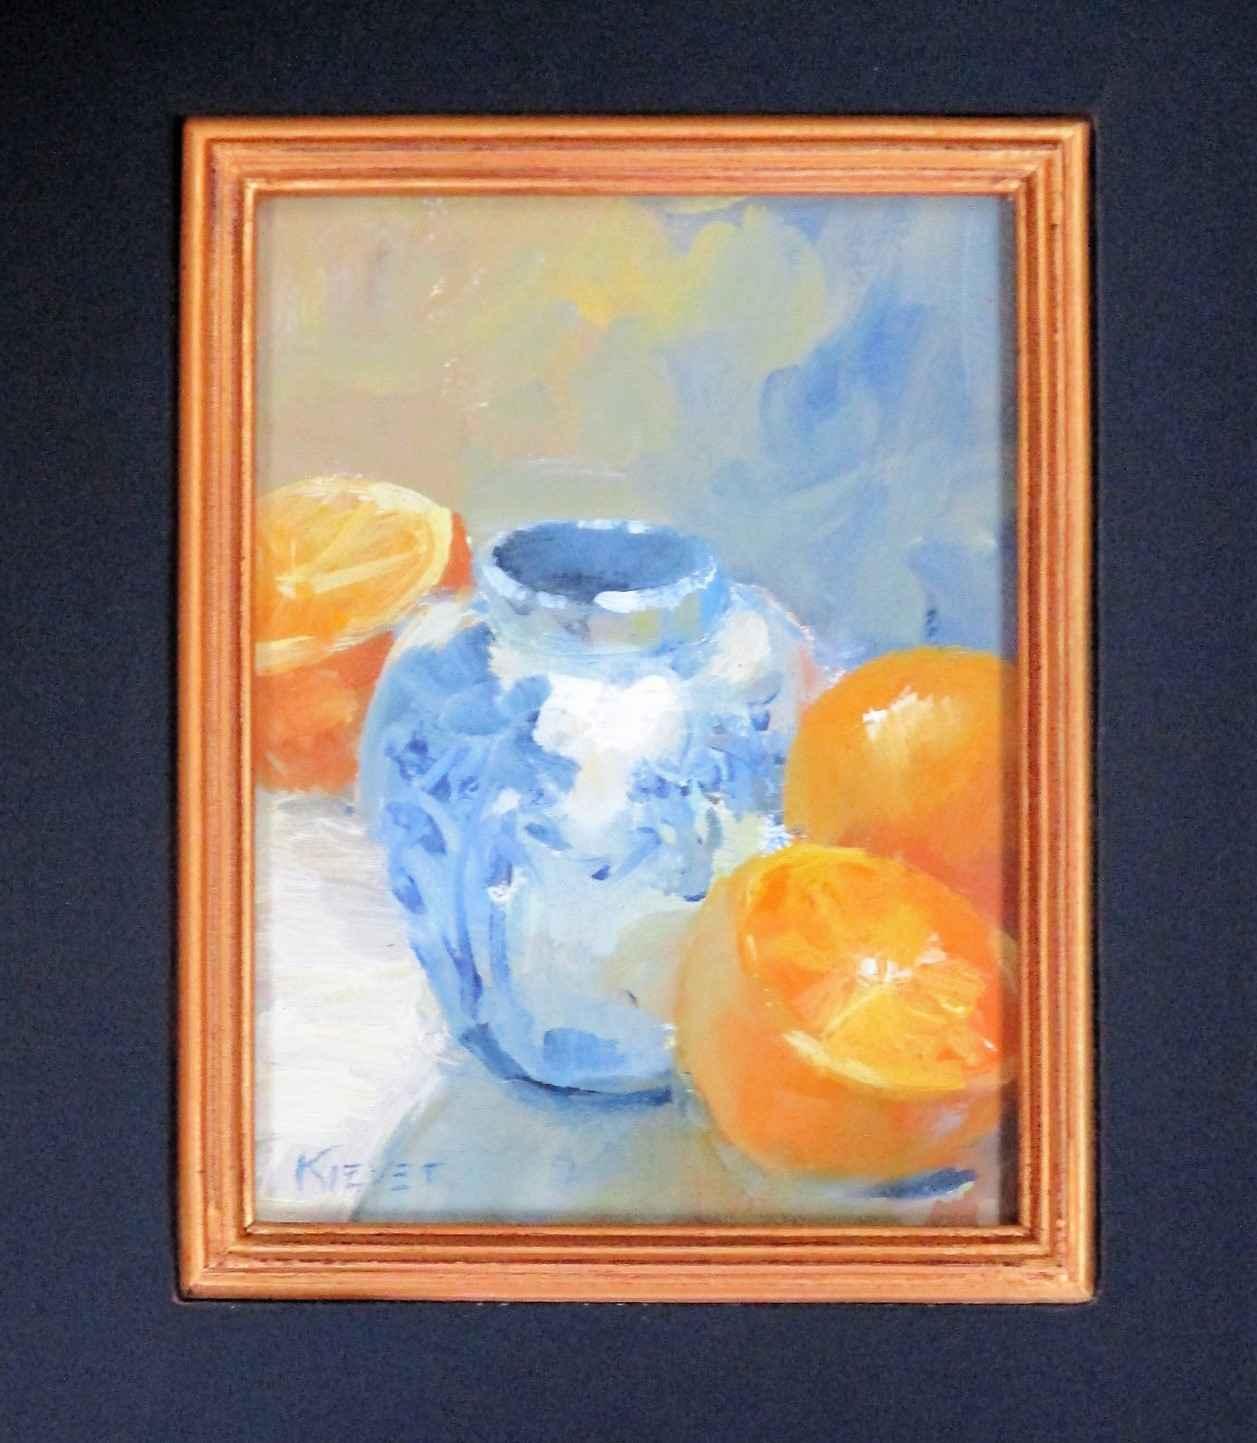 Vase with Oranges by  Fran Kievet - Masterpiece Online